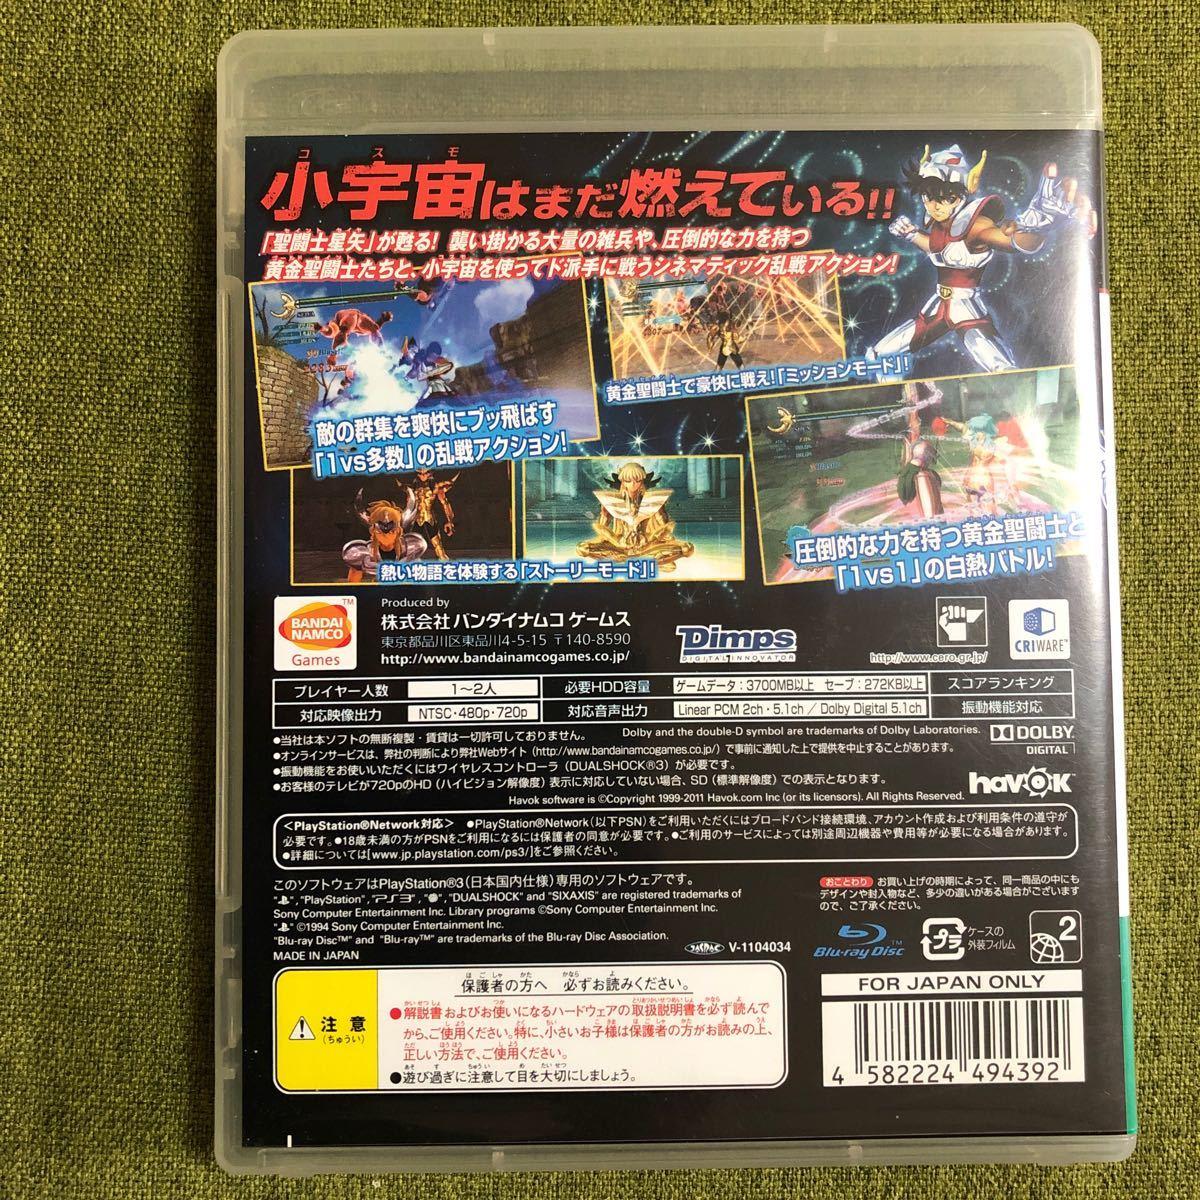 PS3 聖闘士星矢戦記